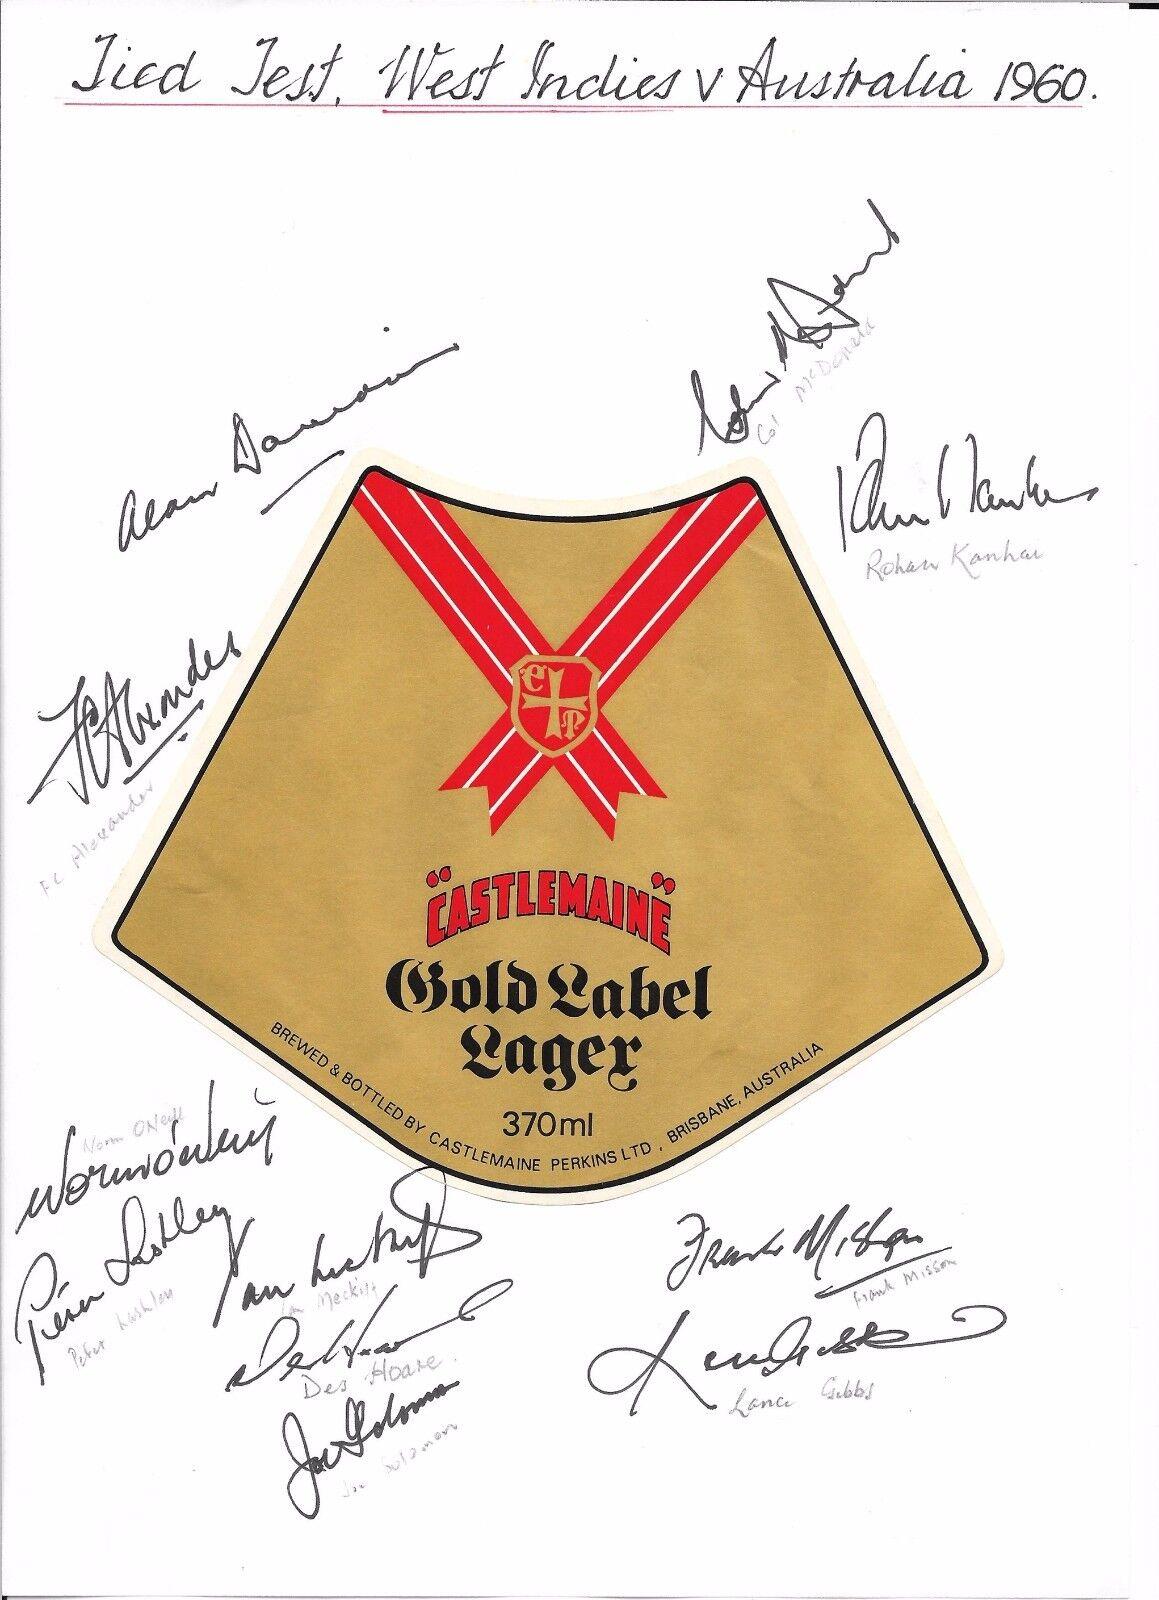 1960 AUSTRALIA v WEST INDIES TIED TEST- 11 AUTOGRAPHS ON A4 MONTAGE - gold LABEL